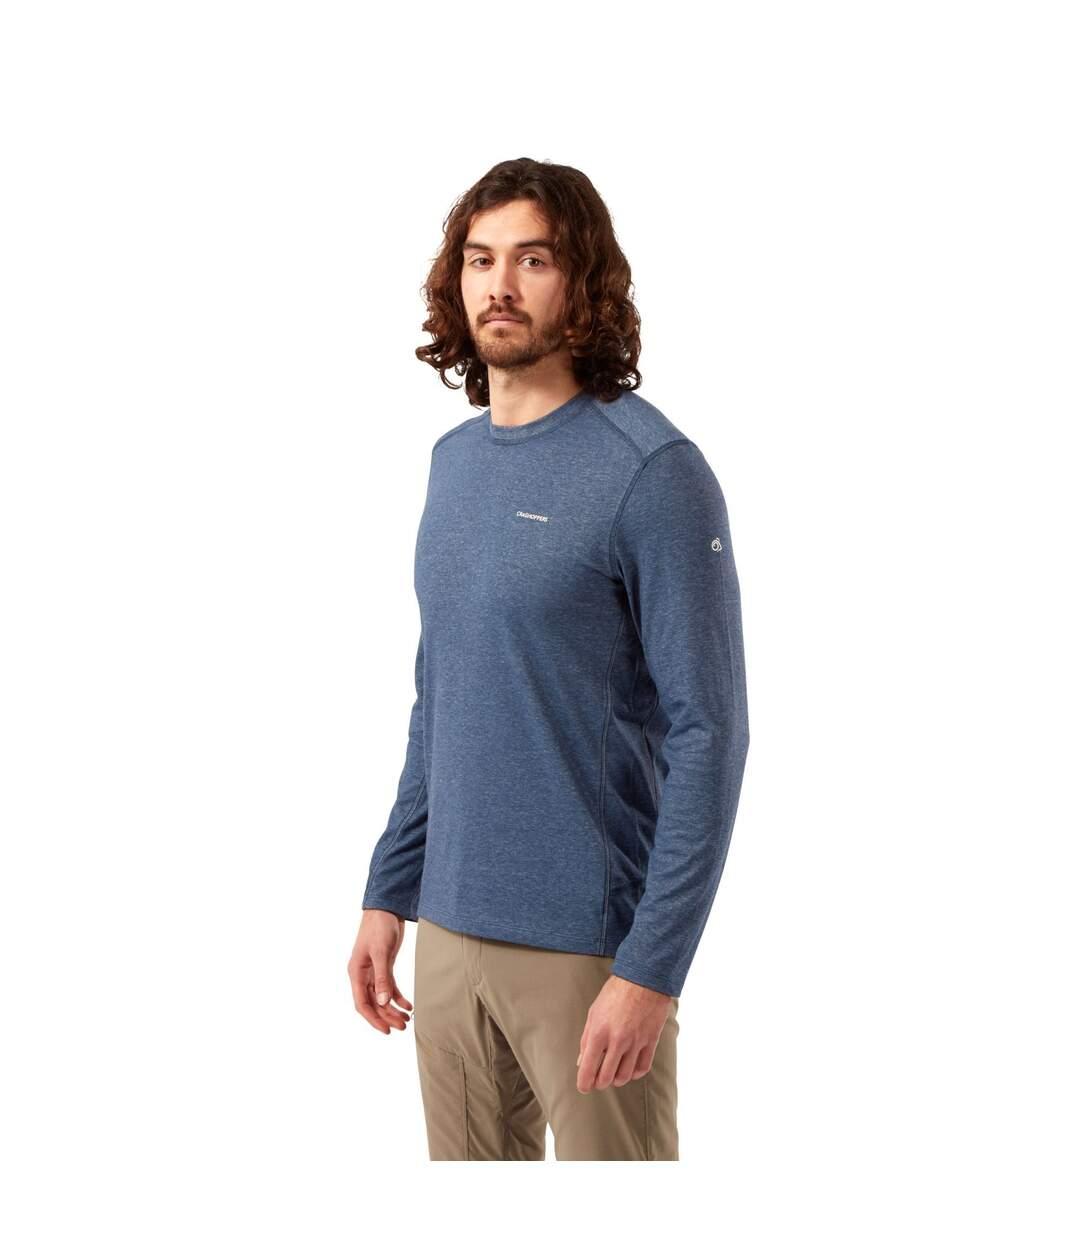 Craghoppers Mens Talen Nosilife Long-Sleeved T-Shirt (Navy Marl) - UTCG1607